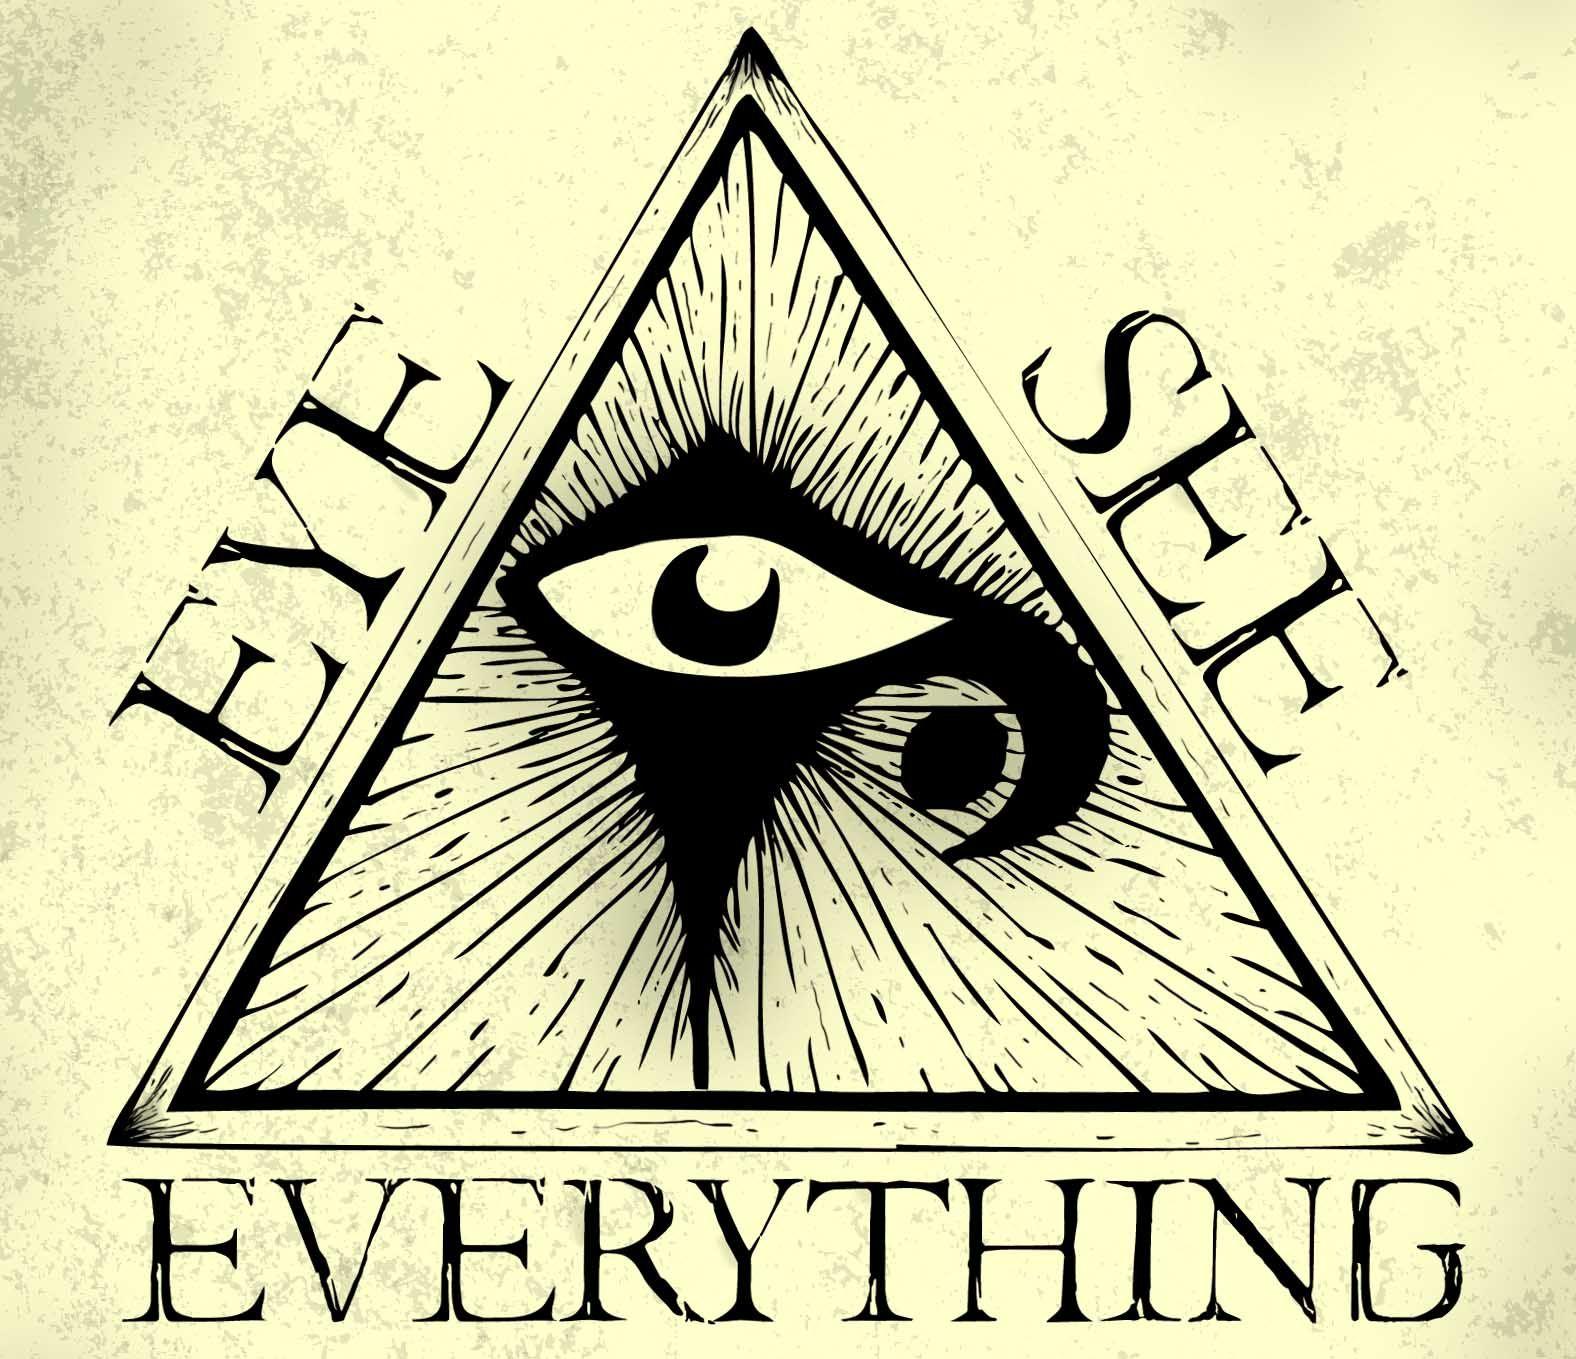 illuminati logos and symbols - photo #20